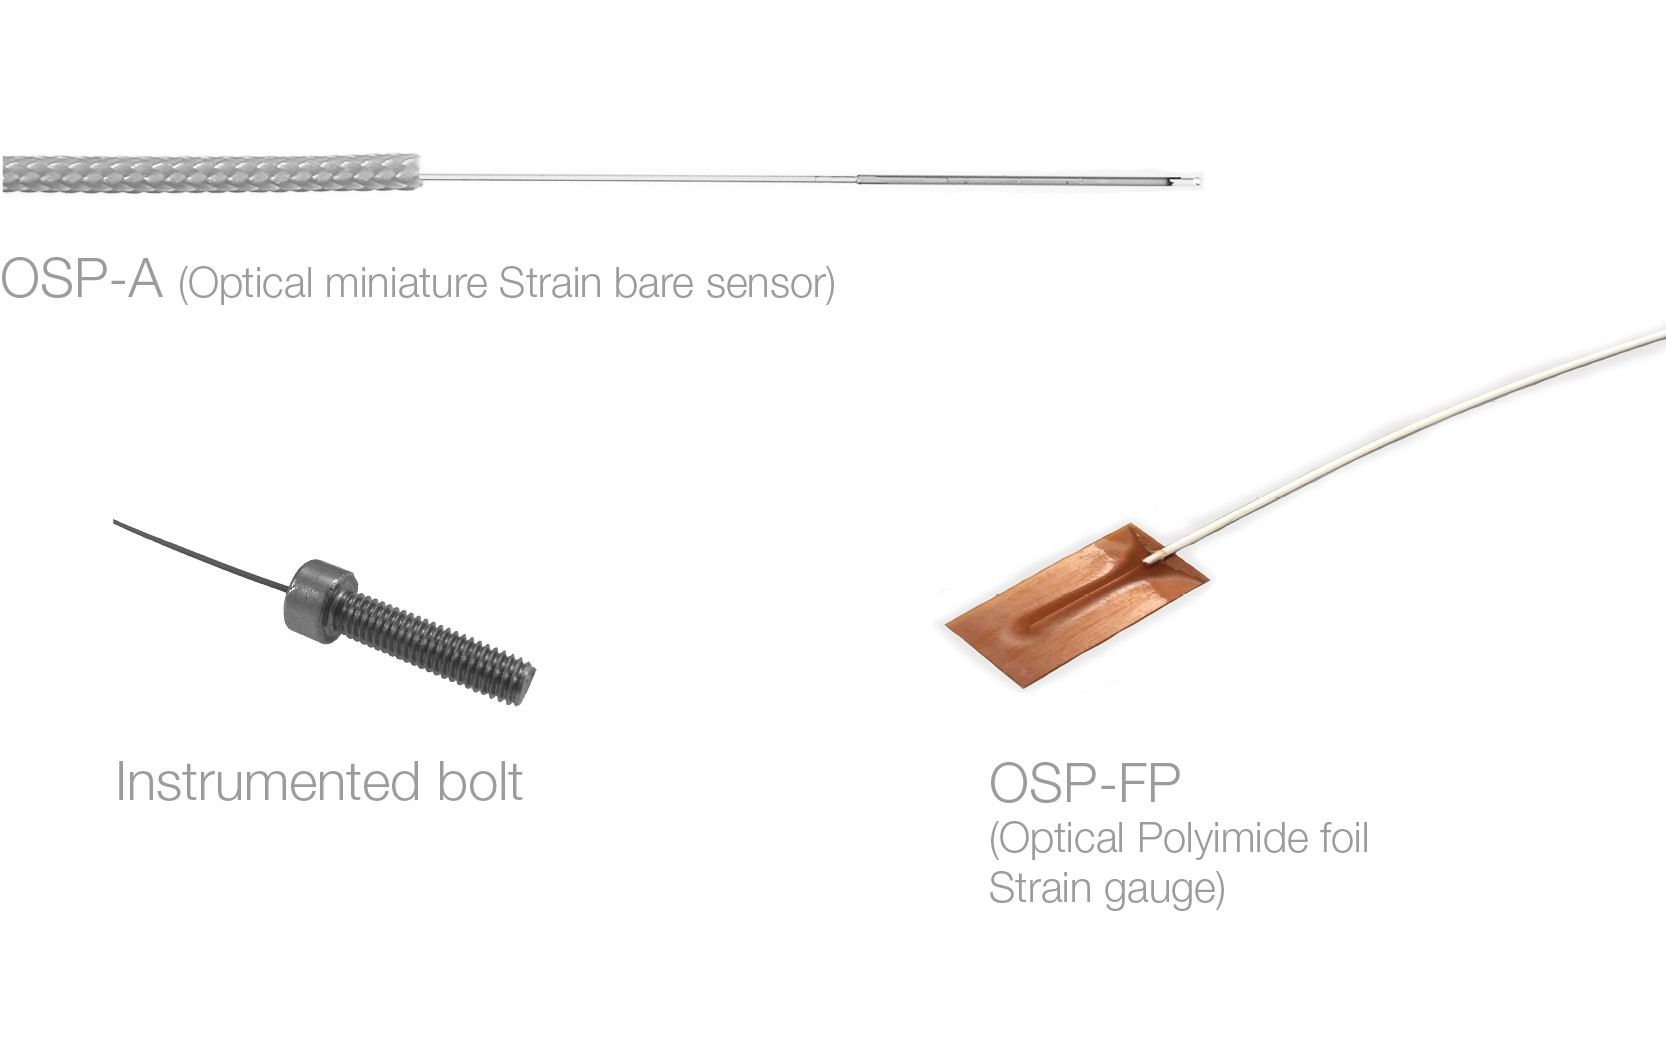 Fiber Optic Strain Sensor Osp A & Osp Fp Fiber Optic Strain Sensor Probe and Transducer Of Fiber Optic Strain Sensor